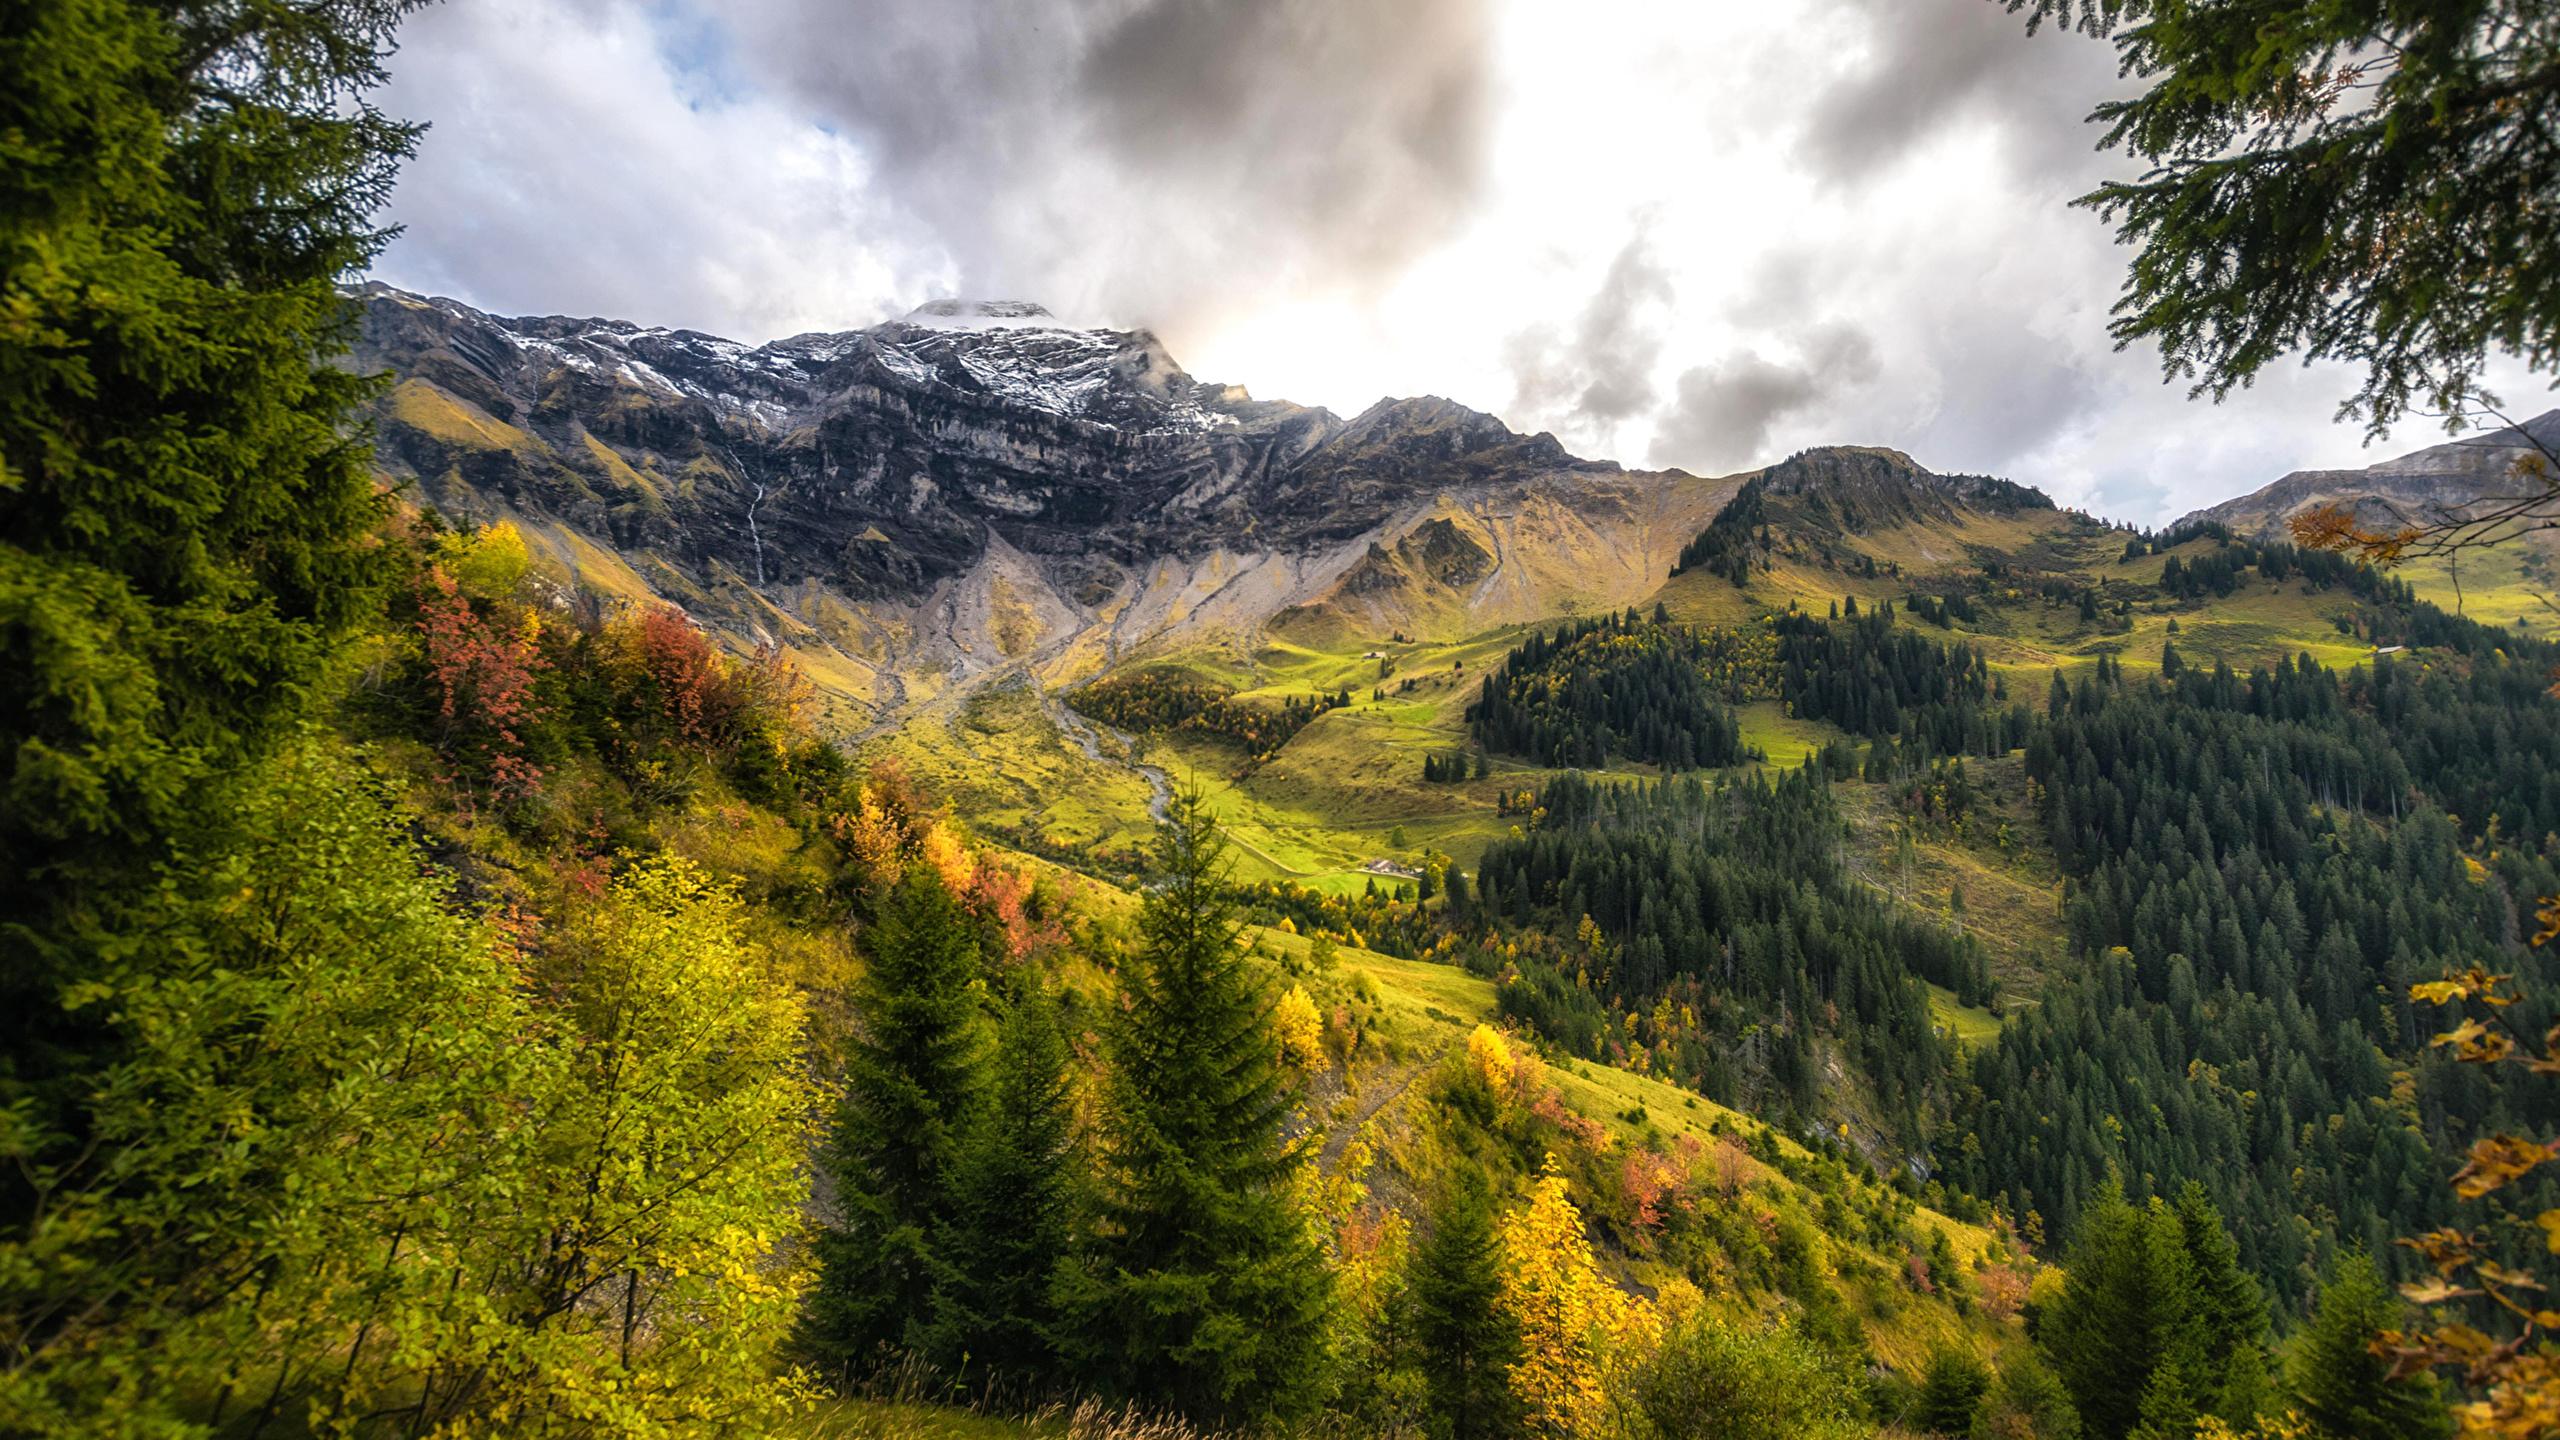 Images Switzerland Interlaken Oberhasli Nature Spruce 2560x1440 2560x1440